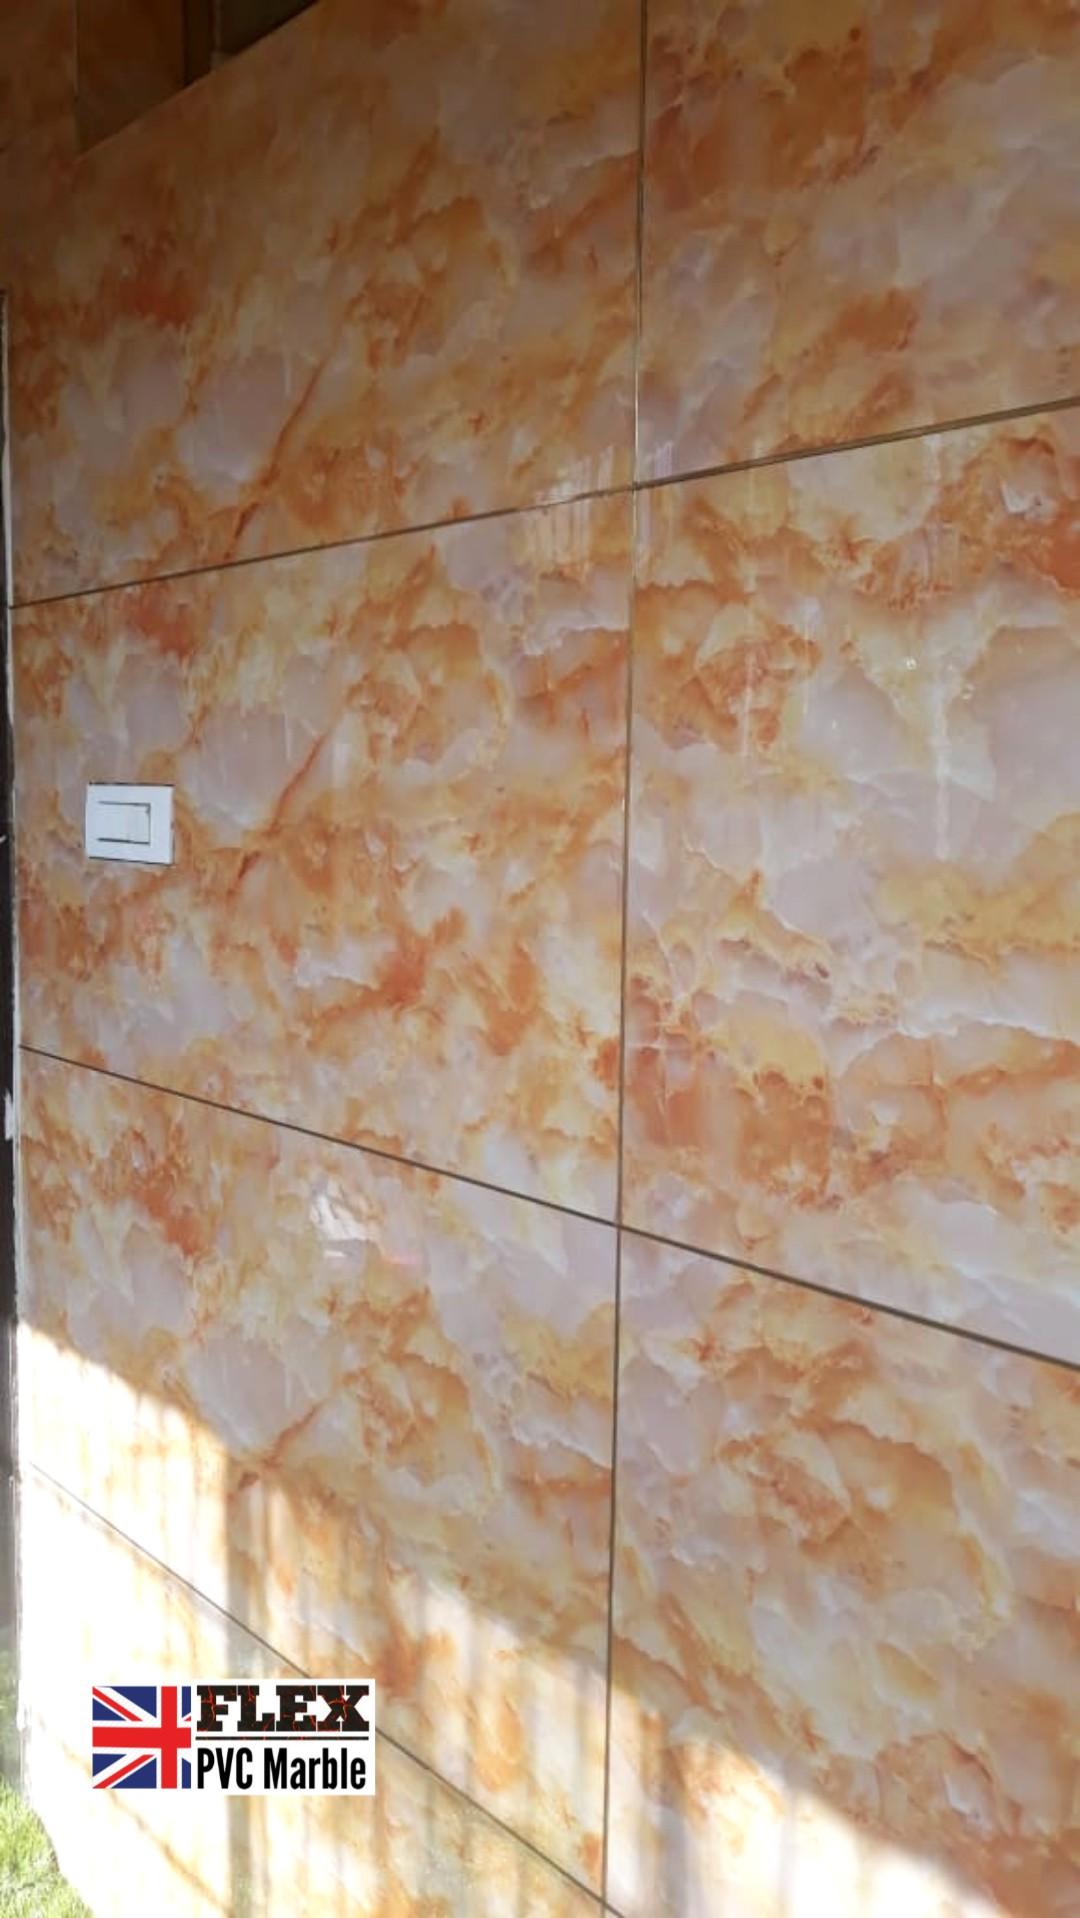 pvc marble progress